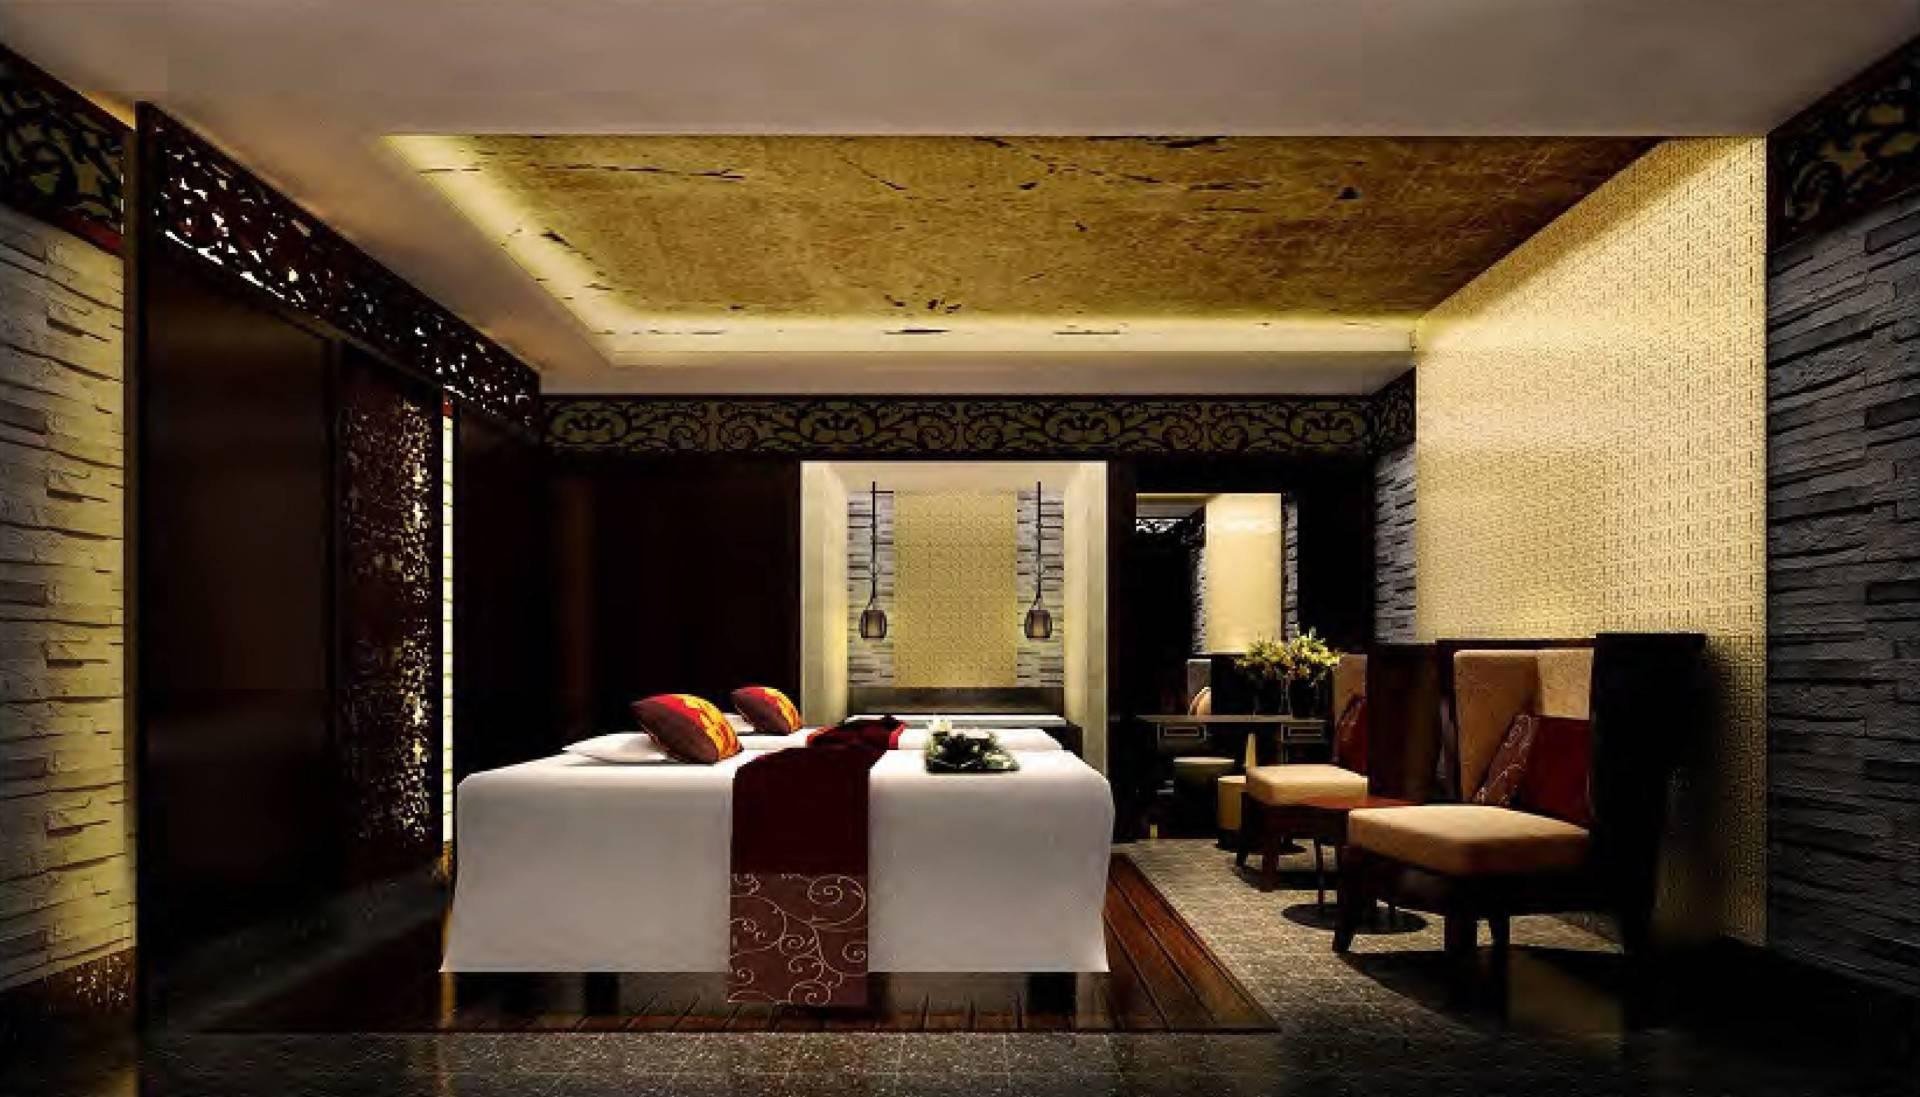 Mul I.d Design Consultant His Highness Sheikh Ammar Al Nuami's Luxury Spa At Ajman United Arab Emirates United Arab Emirates Royal-Couple-Spa-Treatment-Room Modern  3899